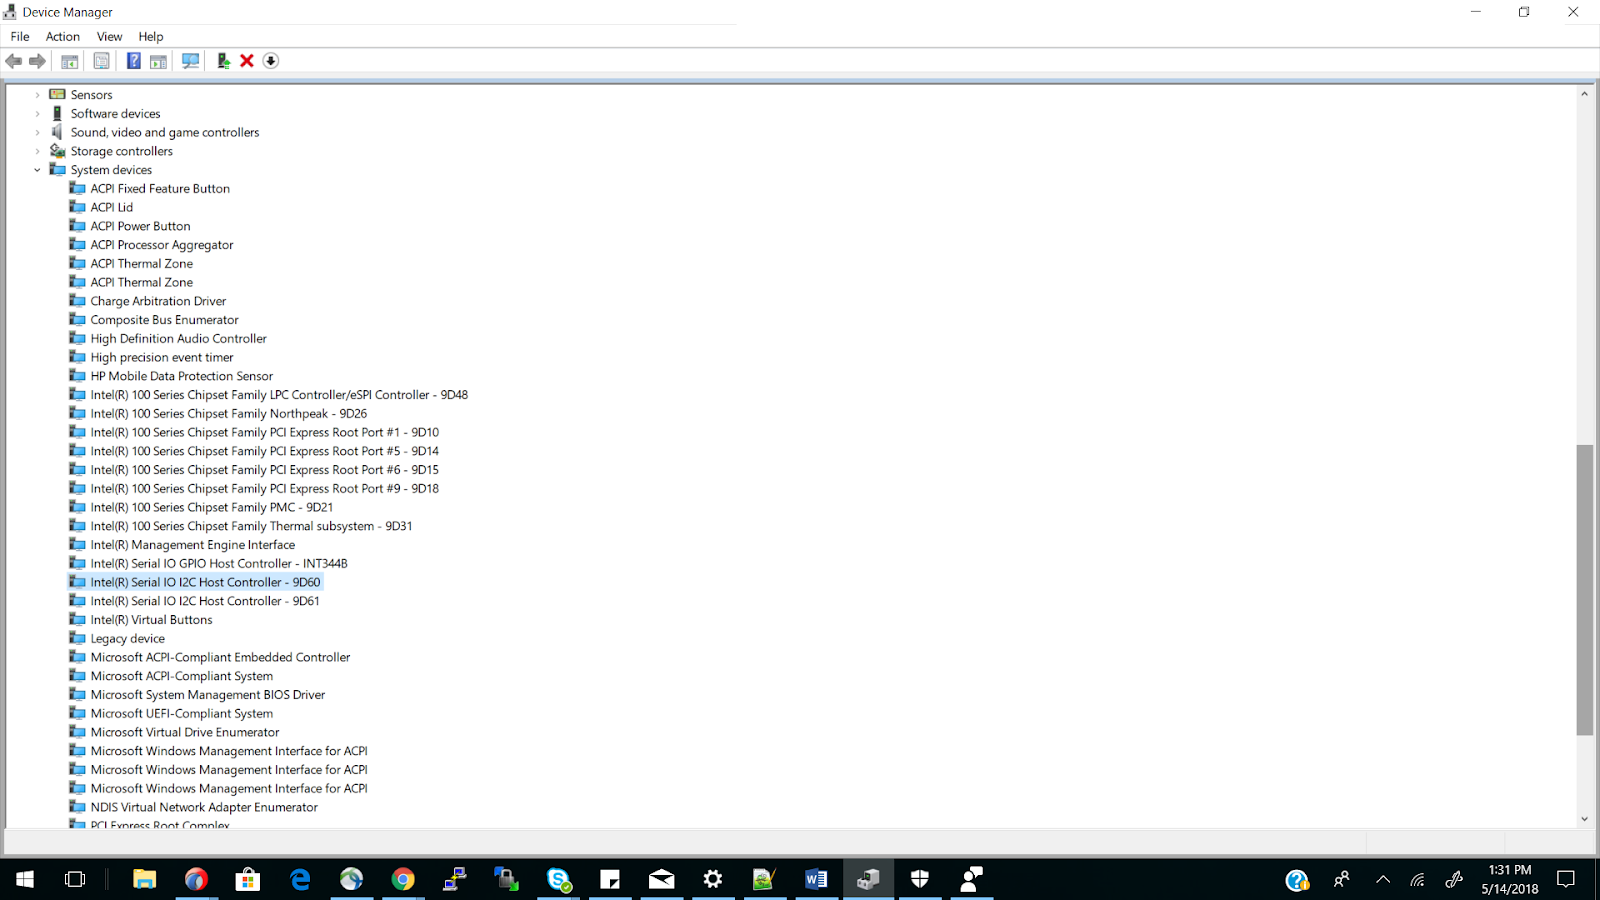 TouchScreen not working in Hp laptop Windows 10 version- 12C